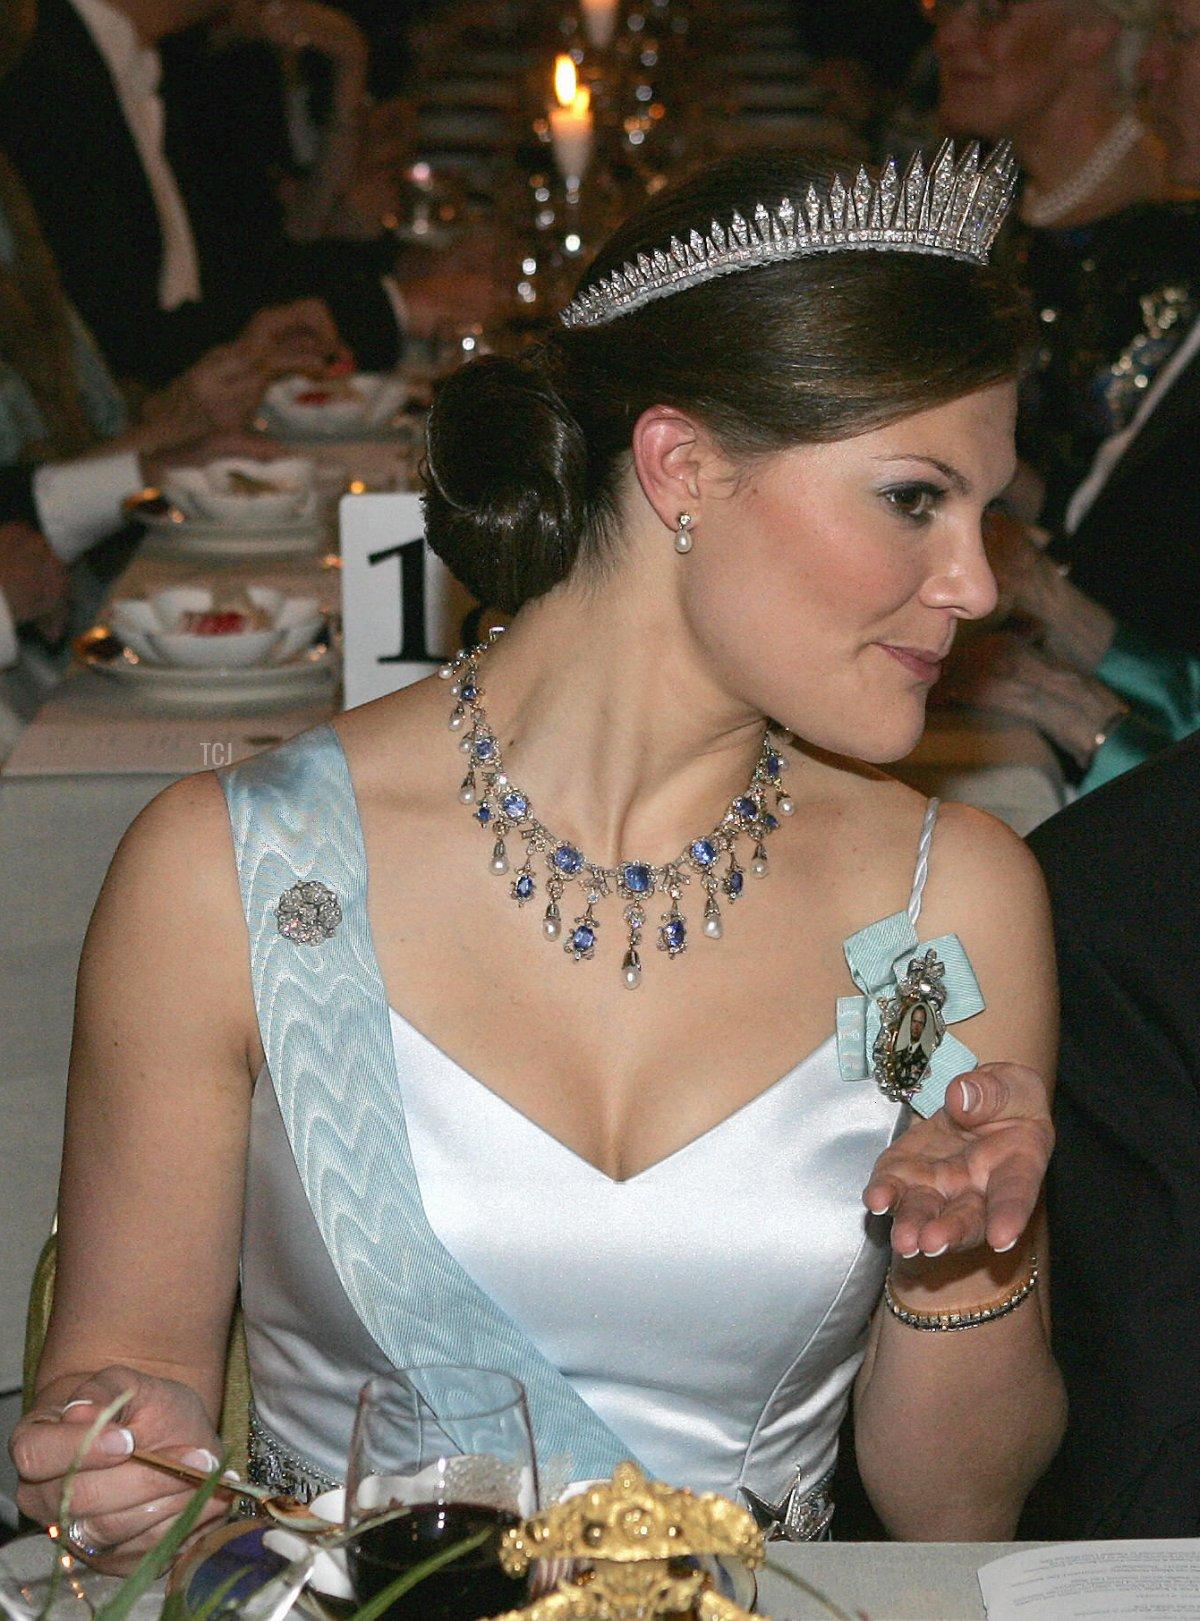 Crown Princess Victoria of Sweden attends the Nobel Banquet at the Stockholm City Hall on December 10, 2005 in Stockholm, Sweden